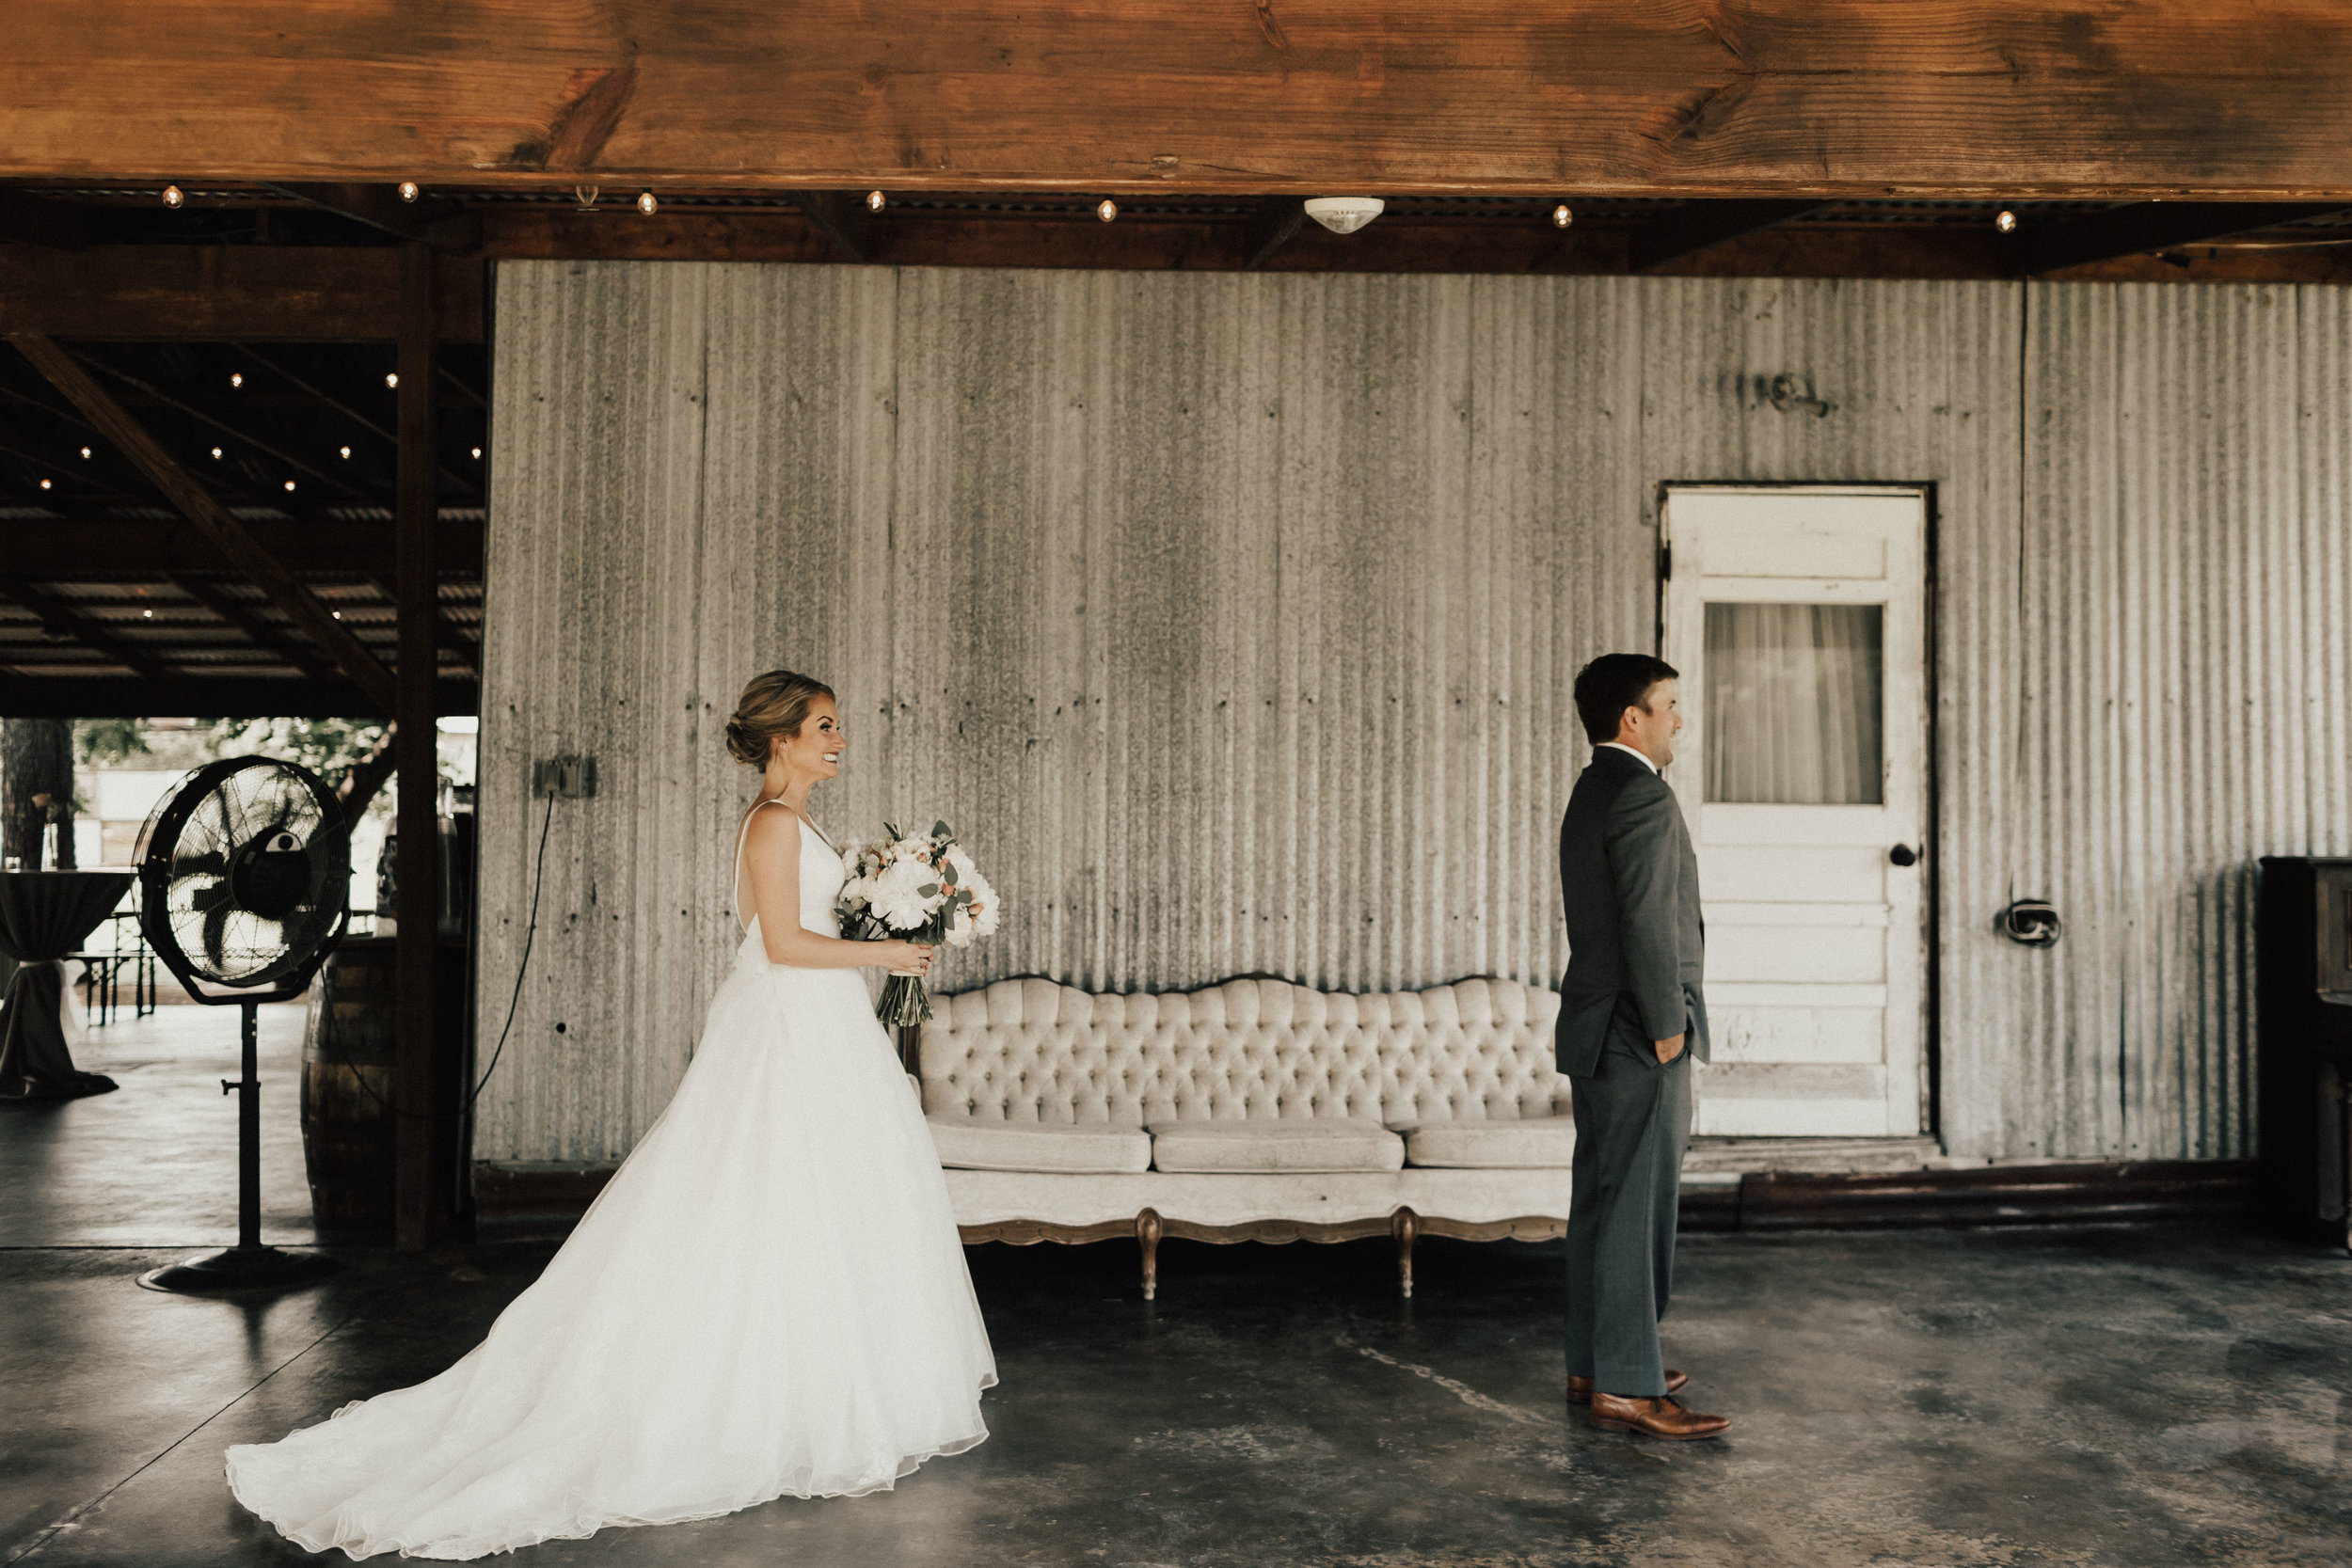 lauren-harrison-wedding-photographer-pecan-springs-ranch-austin-texas--458.jpg